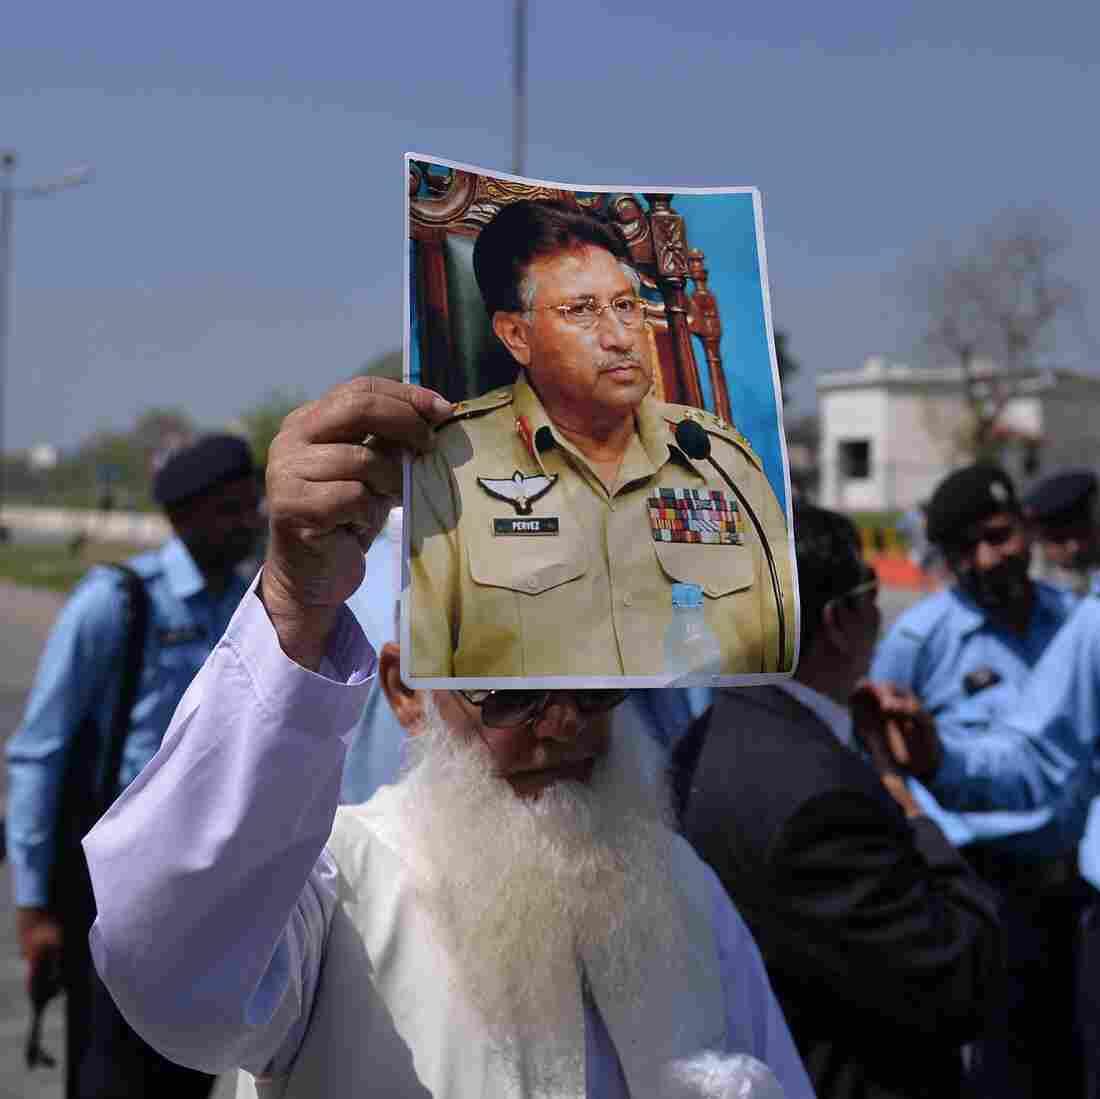 At Indictment, Pakistan's Musharraf Asserts His Innocence